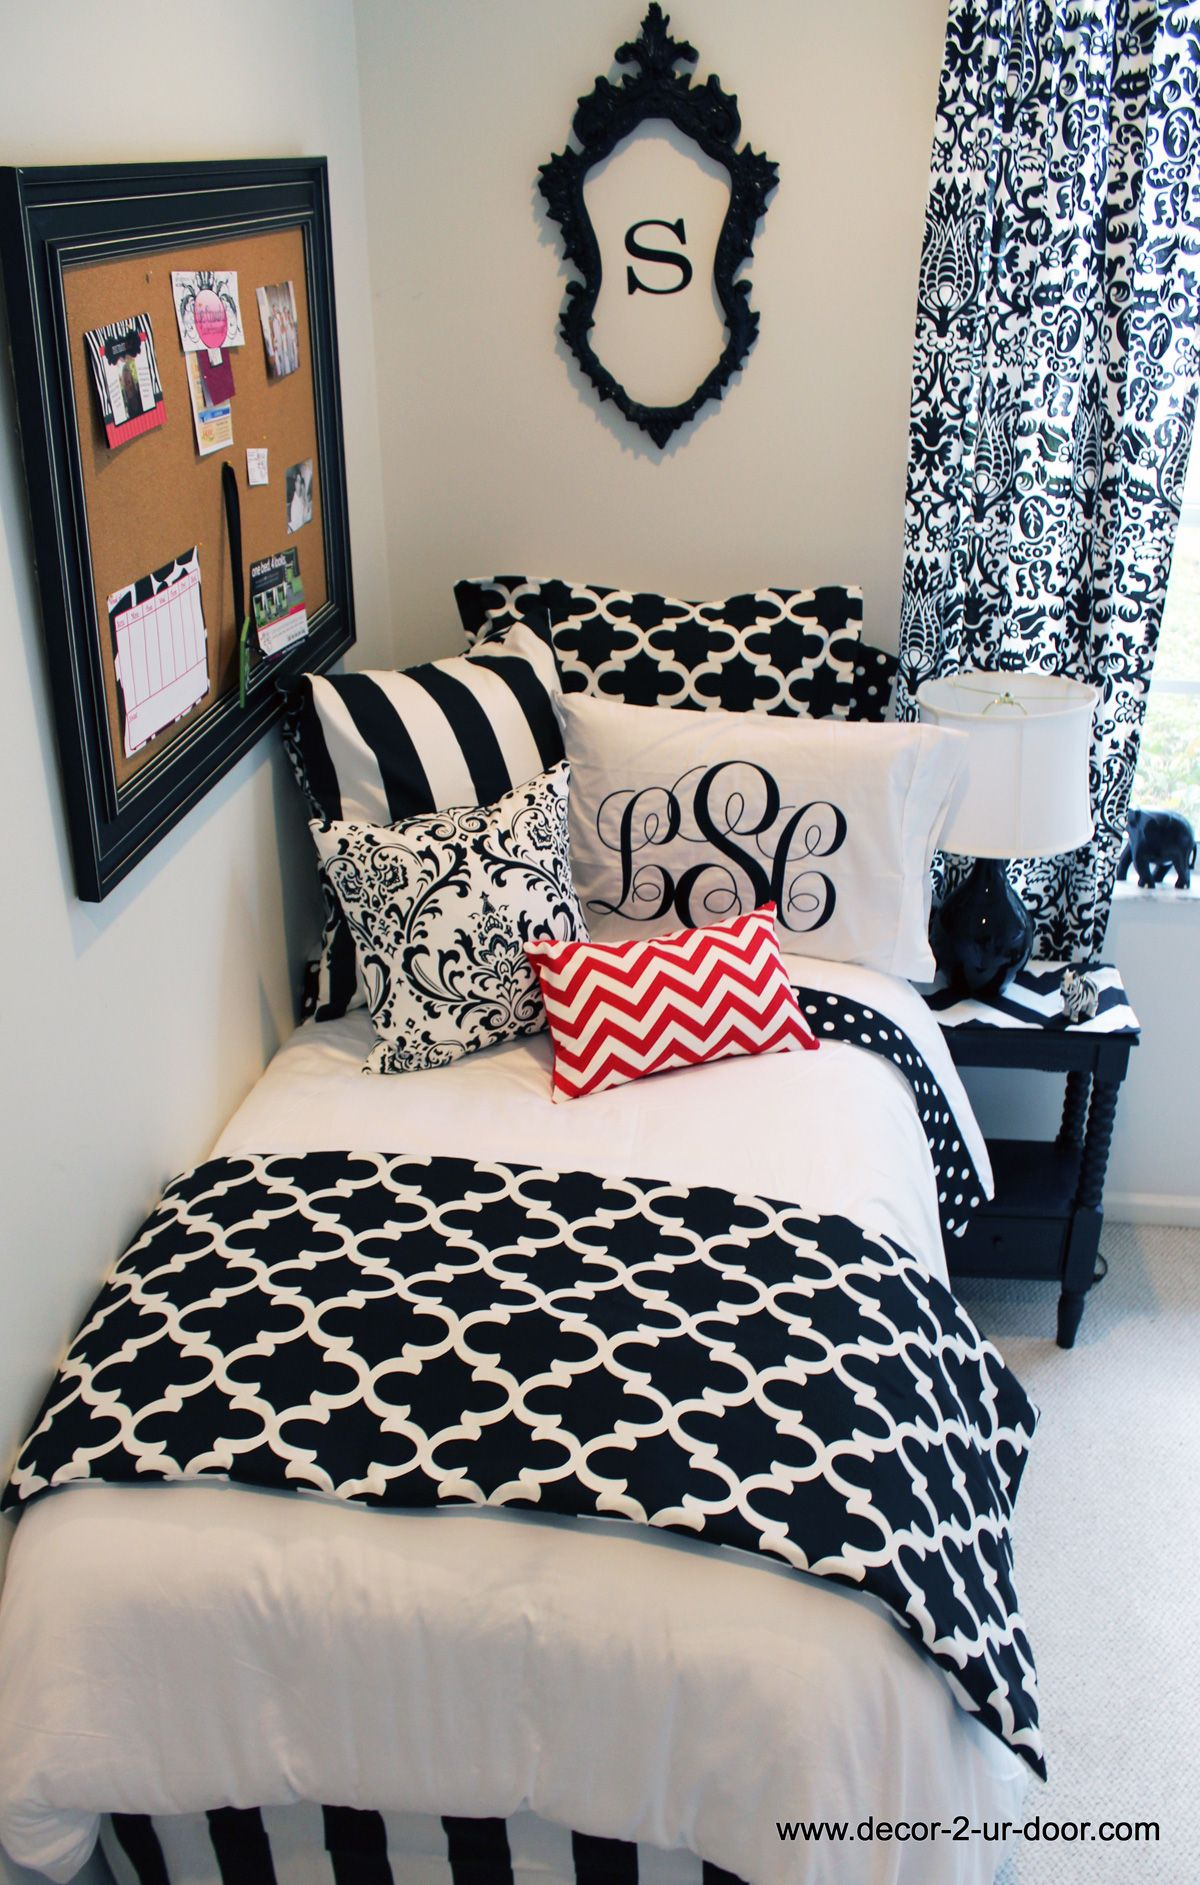 Inspiration Gallery for Bedroom Decor Bedding Dorm Room Teen